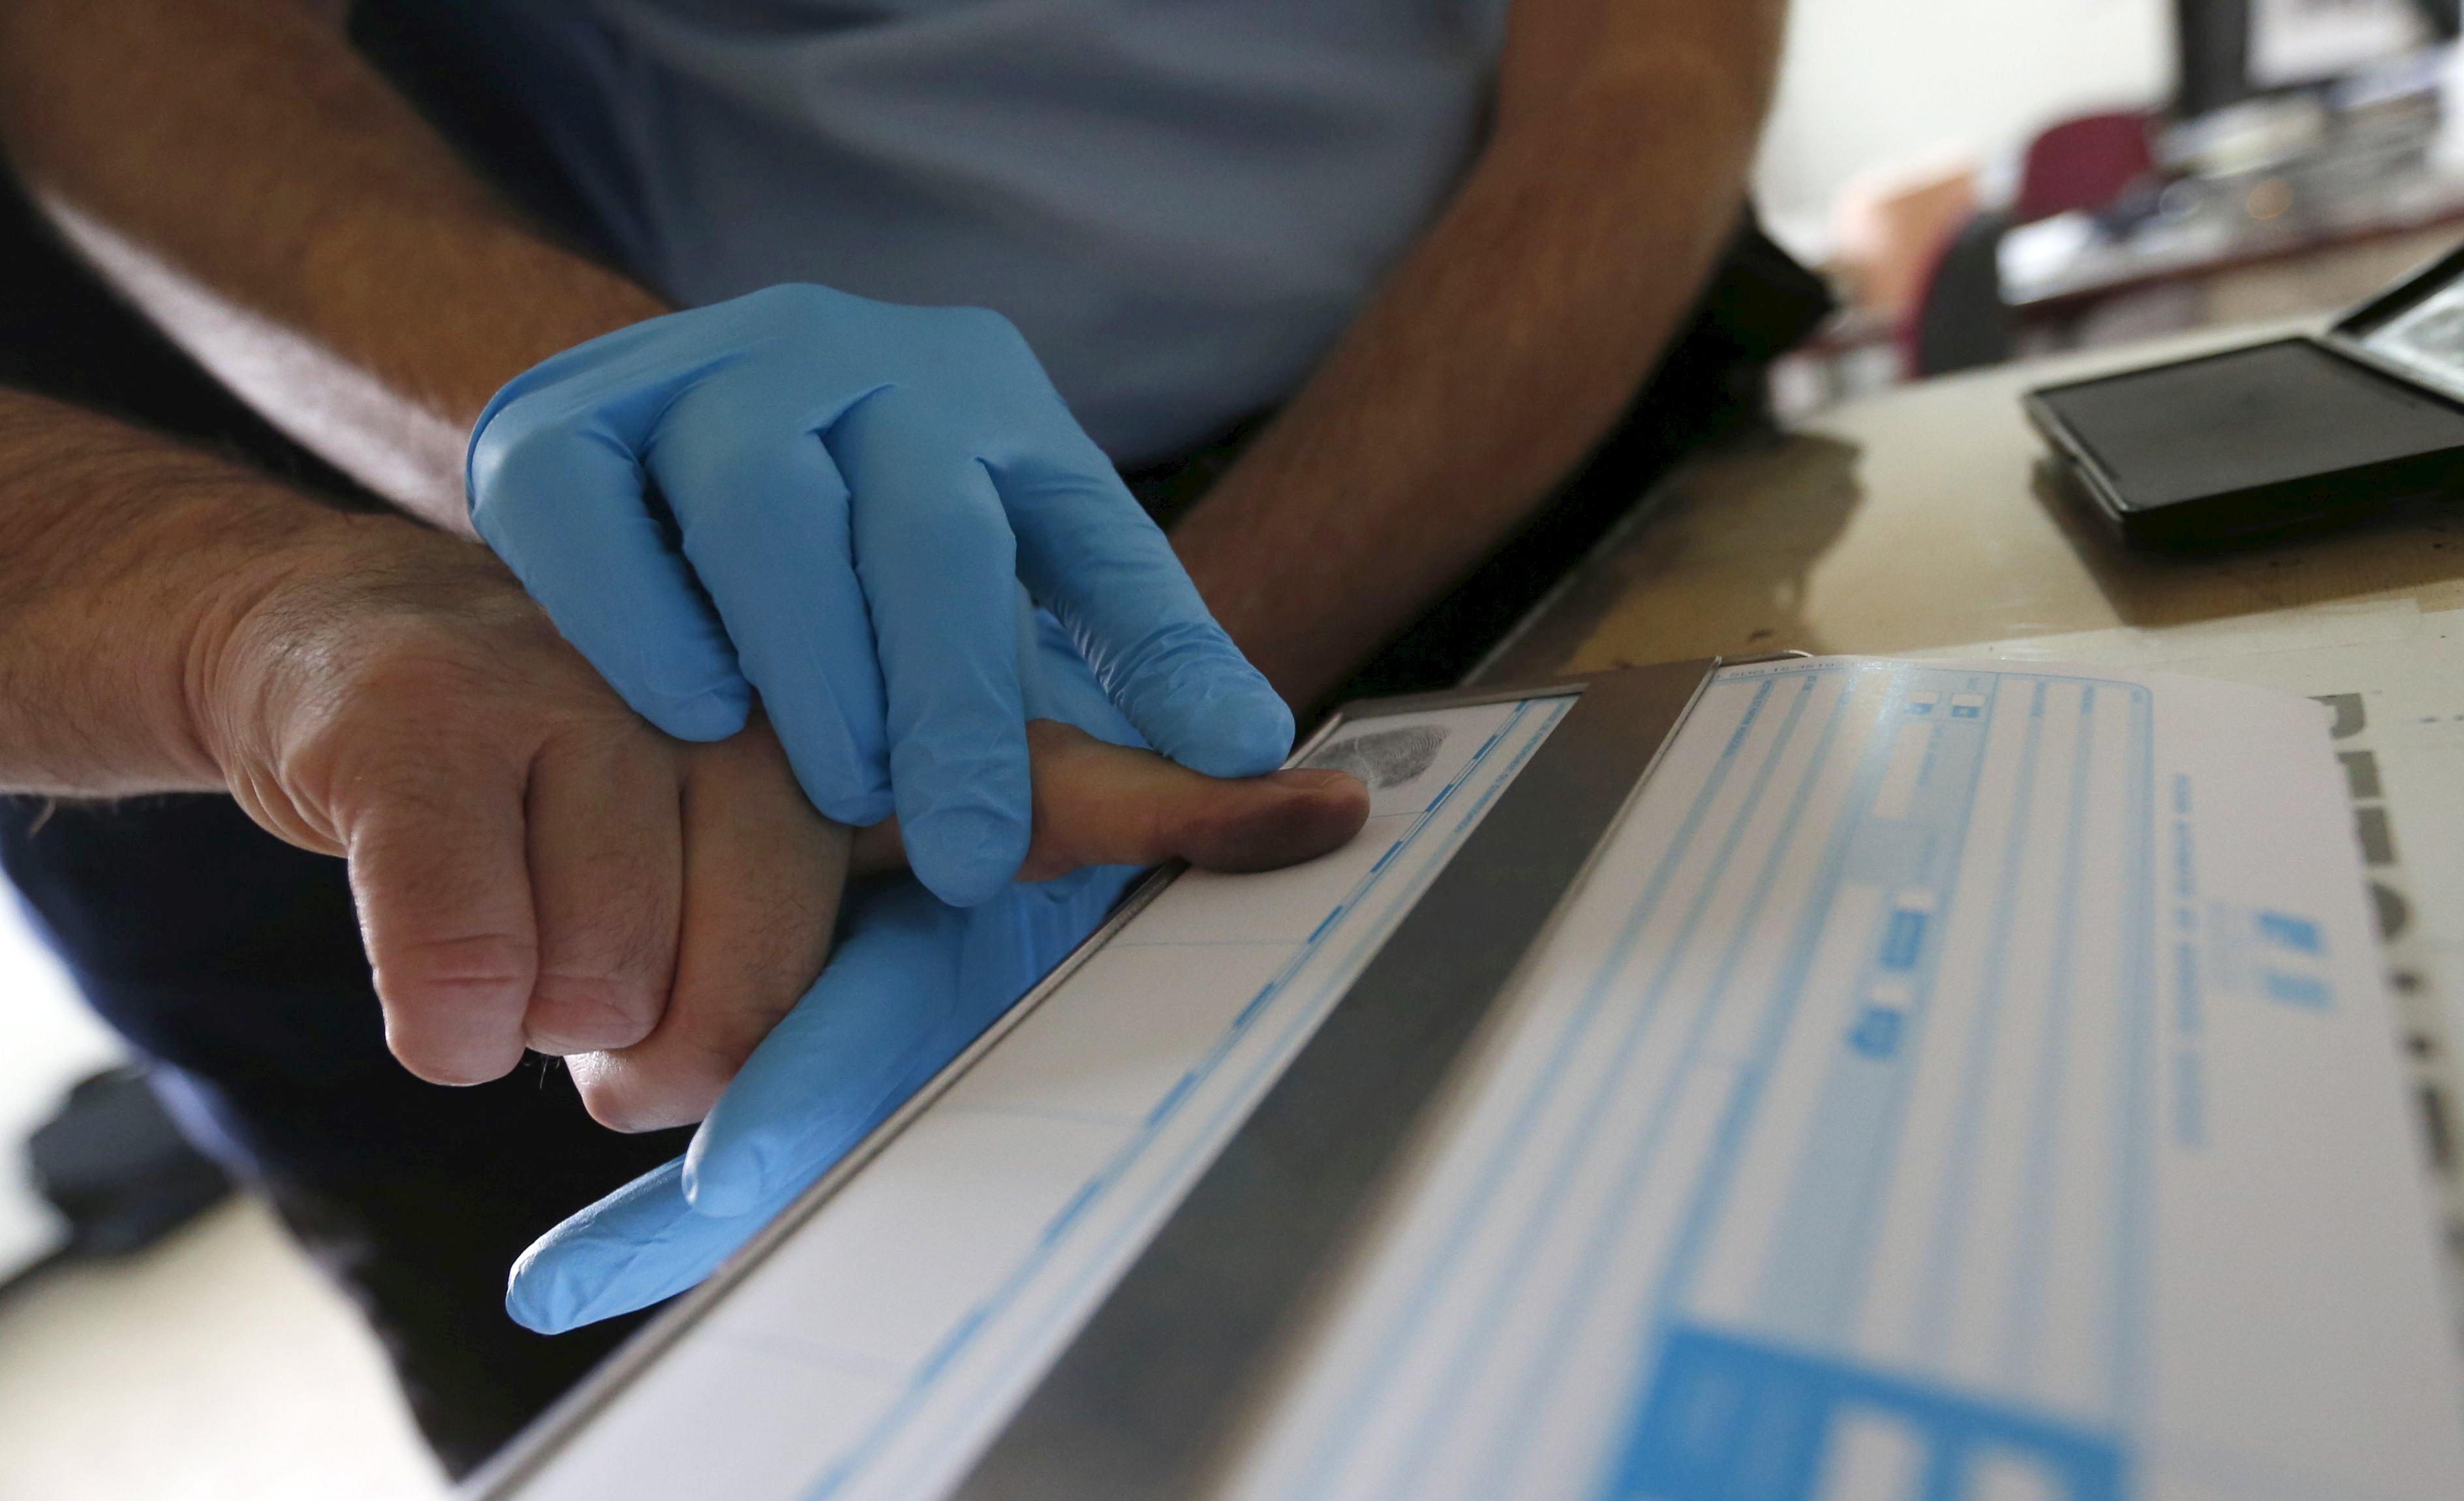 A French Gendarme takes a man's fingerprints in Bordeaux, Southwestern France, March 7, 2016.